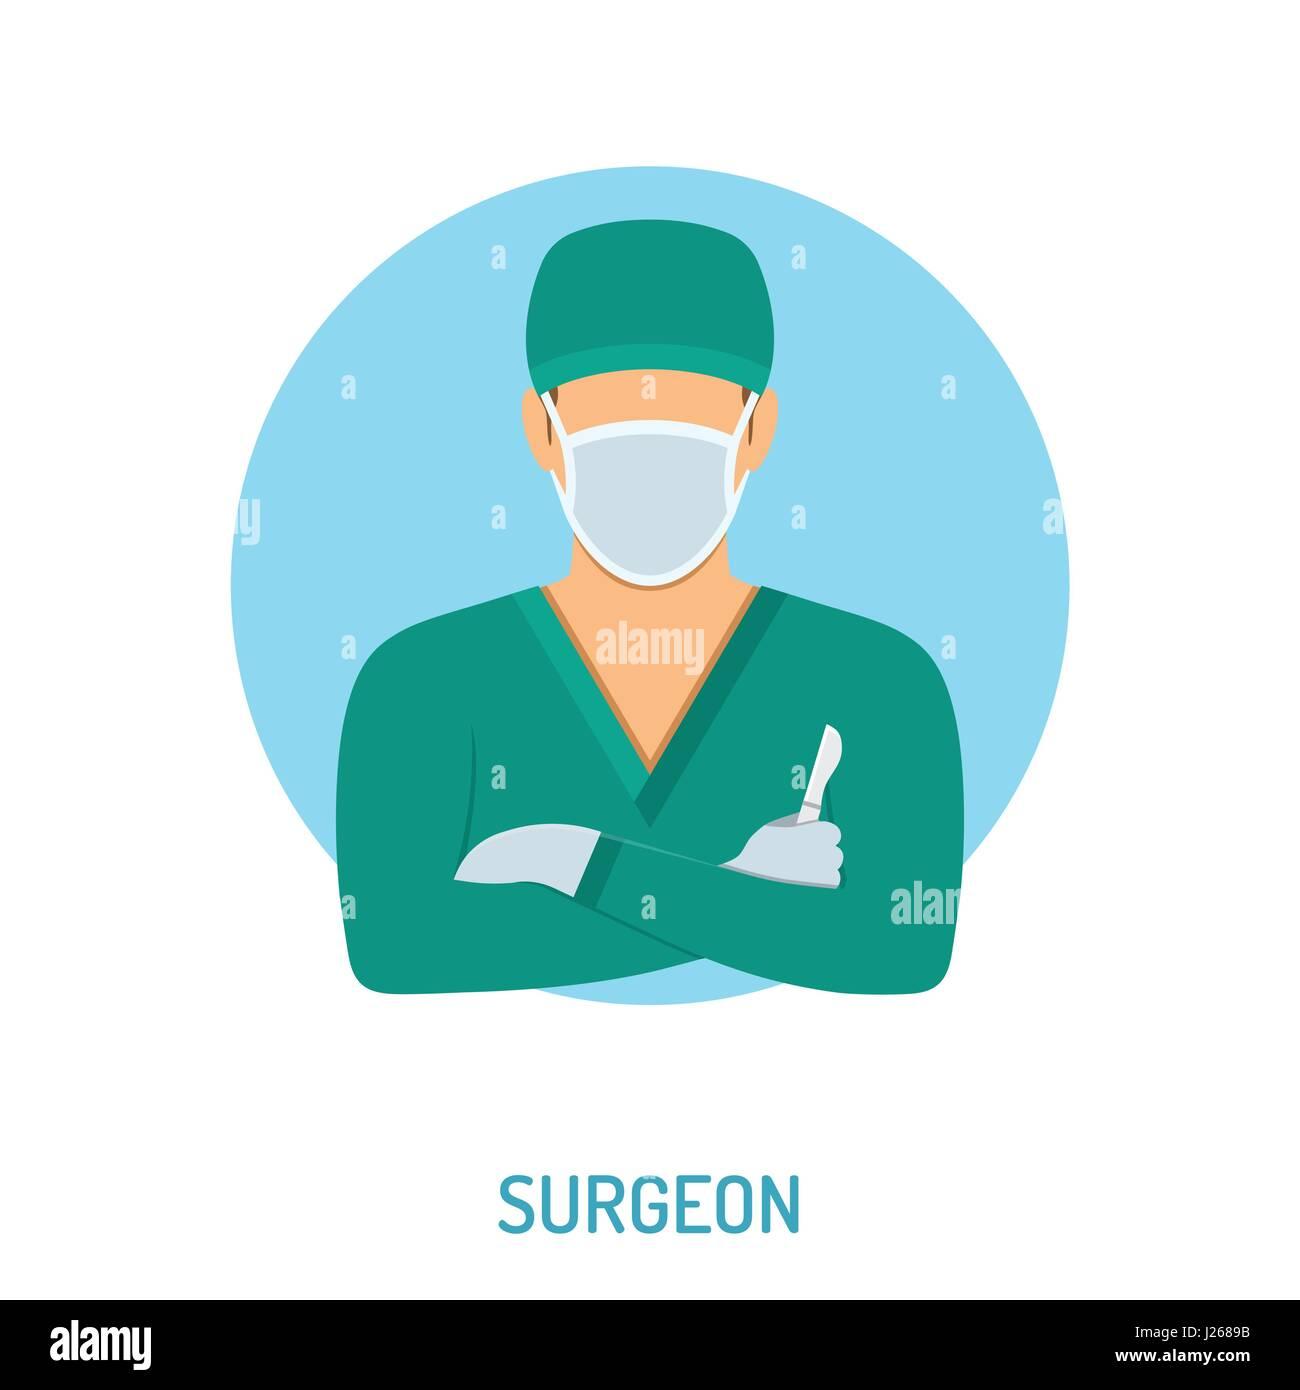 Doctor Surgeon Concept Stock Vector Image Art Alamy